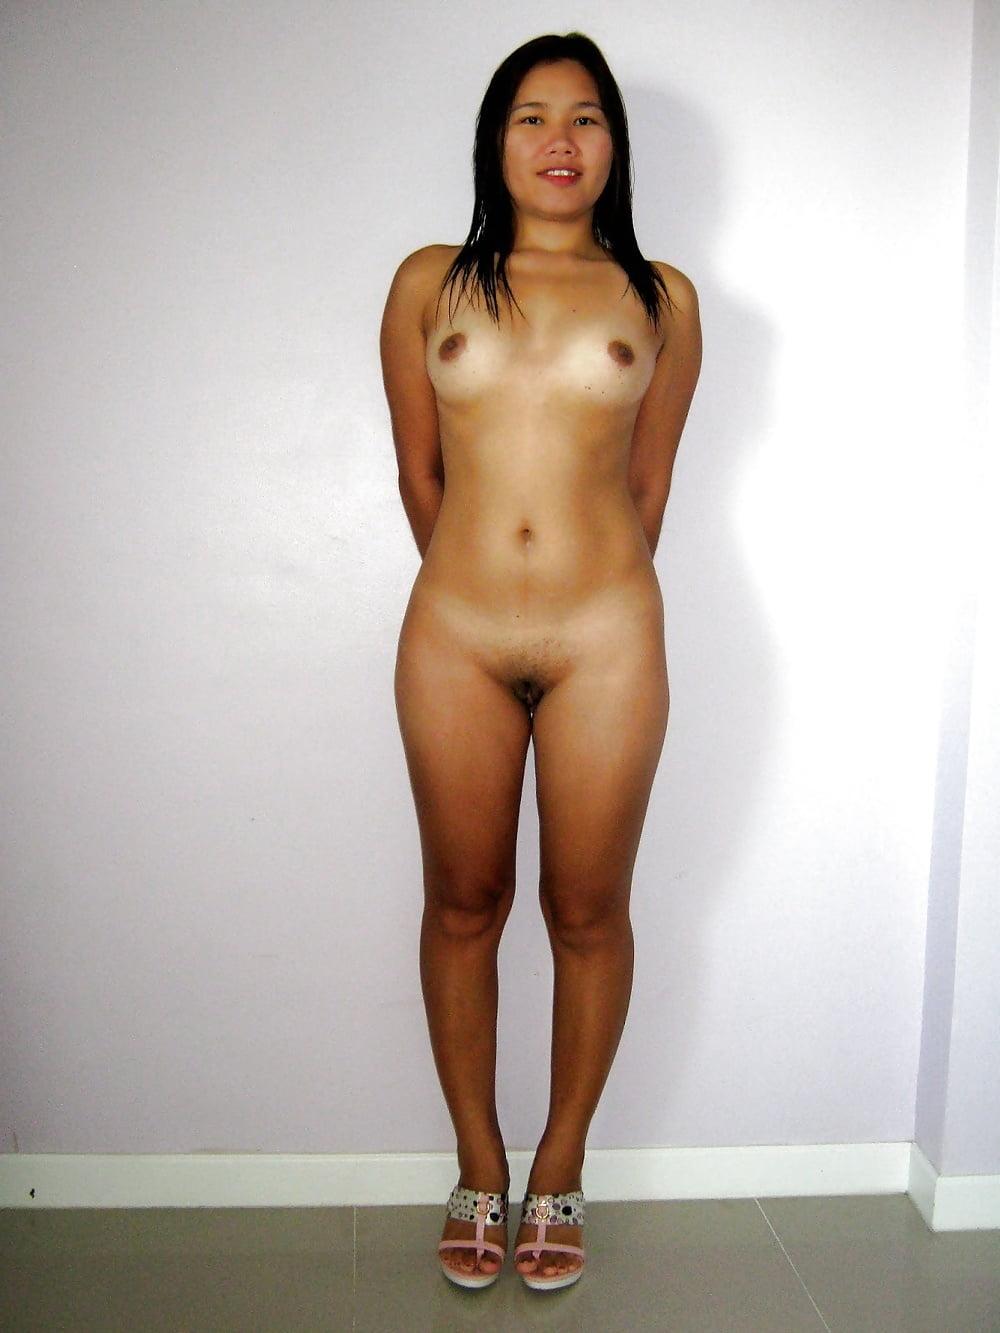 Pretty filipina girls